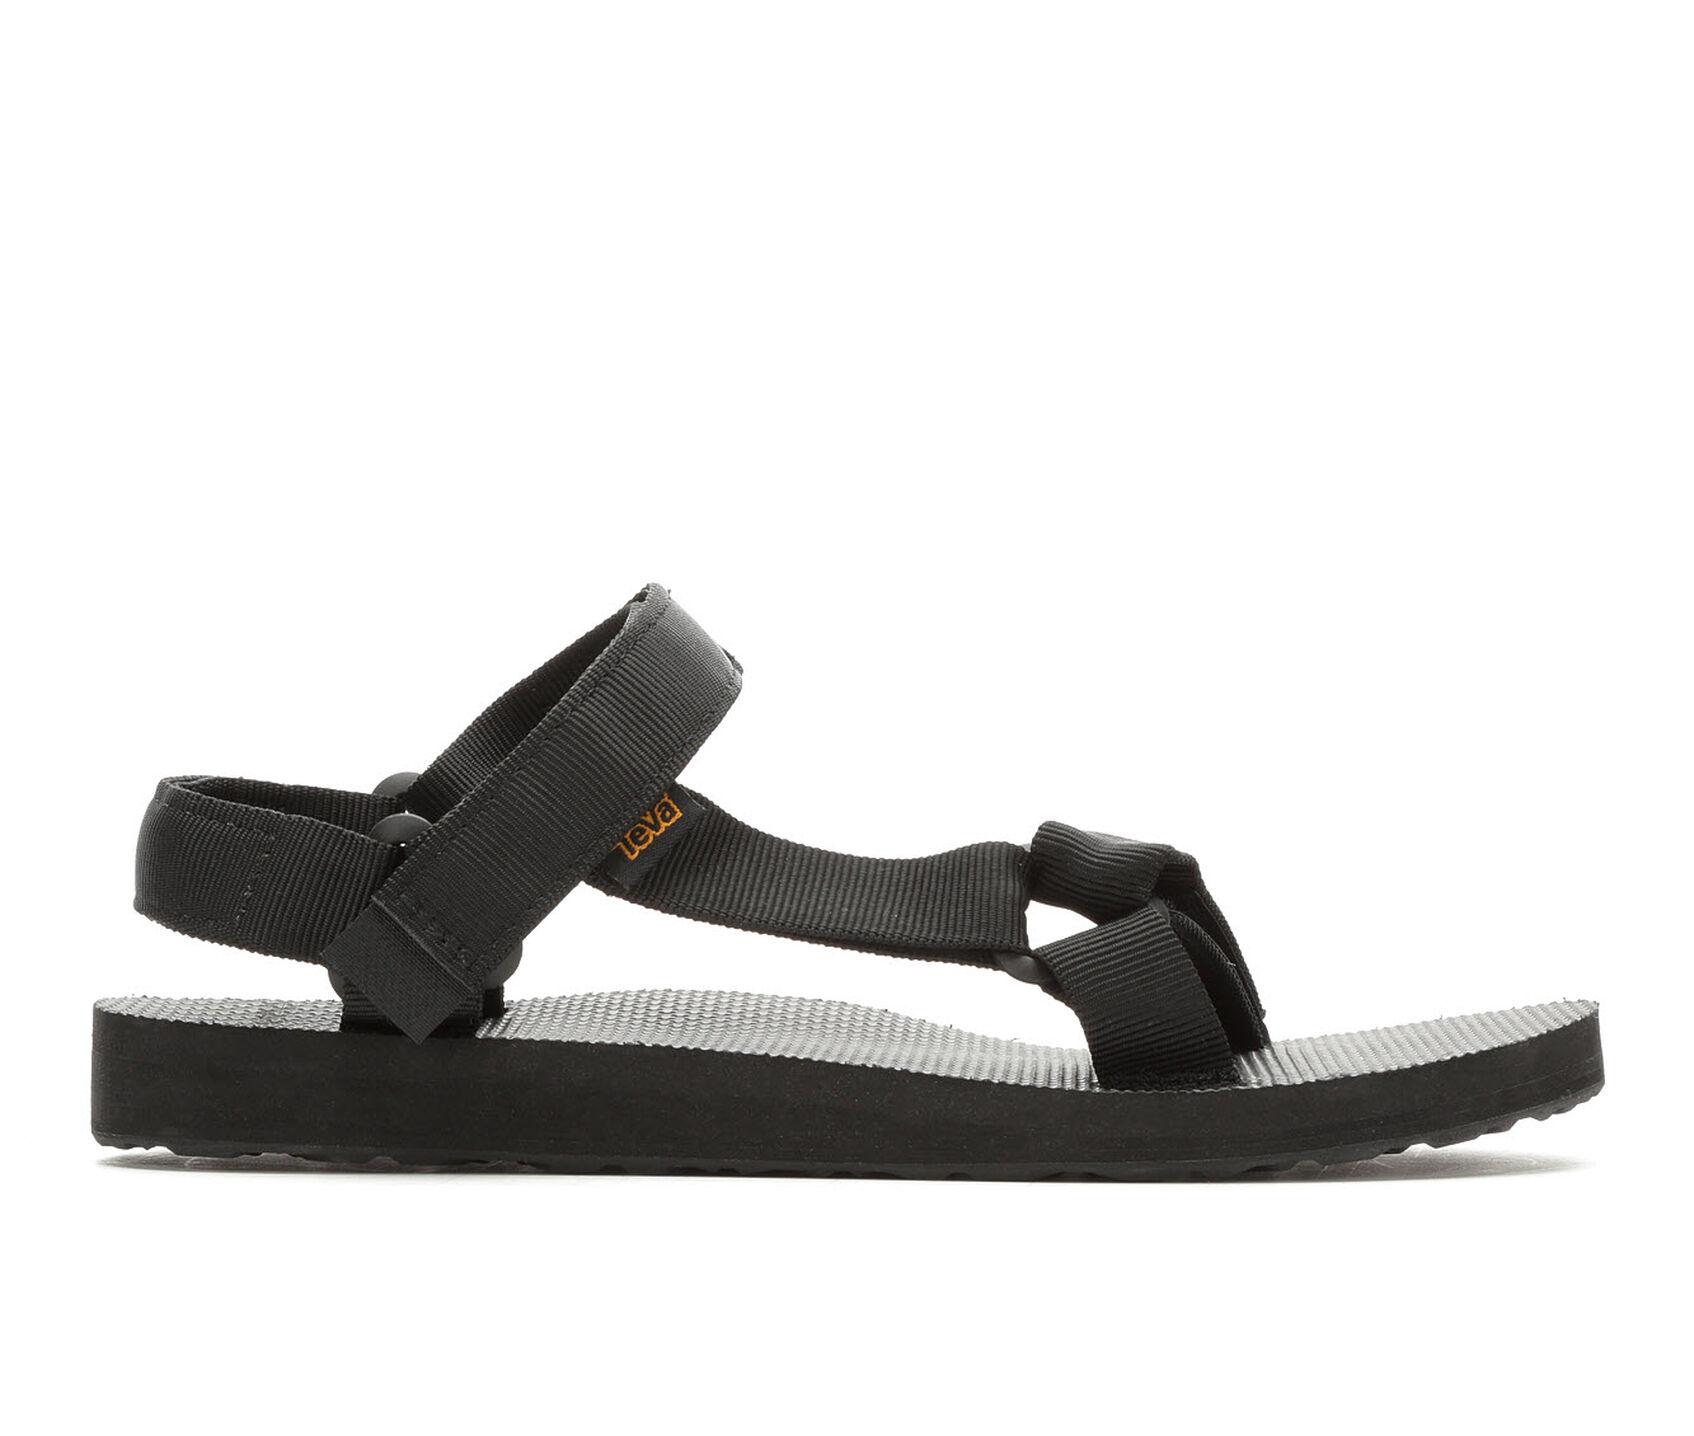 7d55215dc32 ... Teva Original Universal Hiking Sandals. Previous